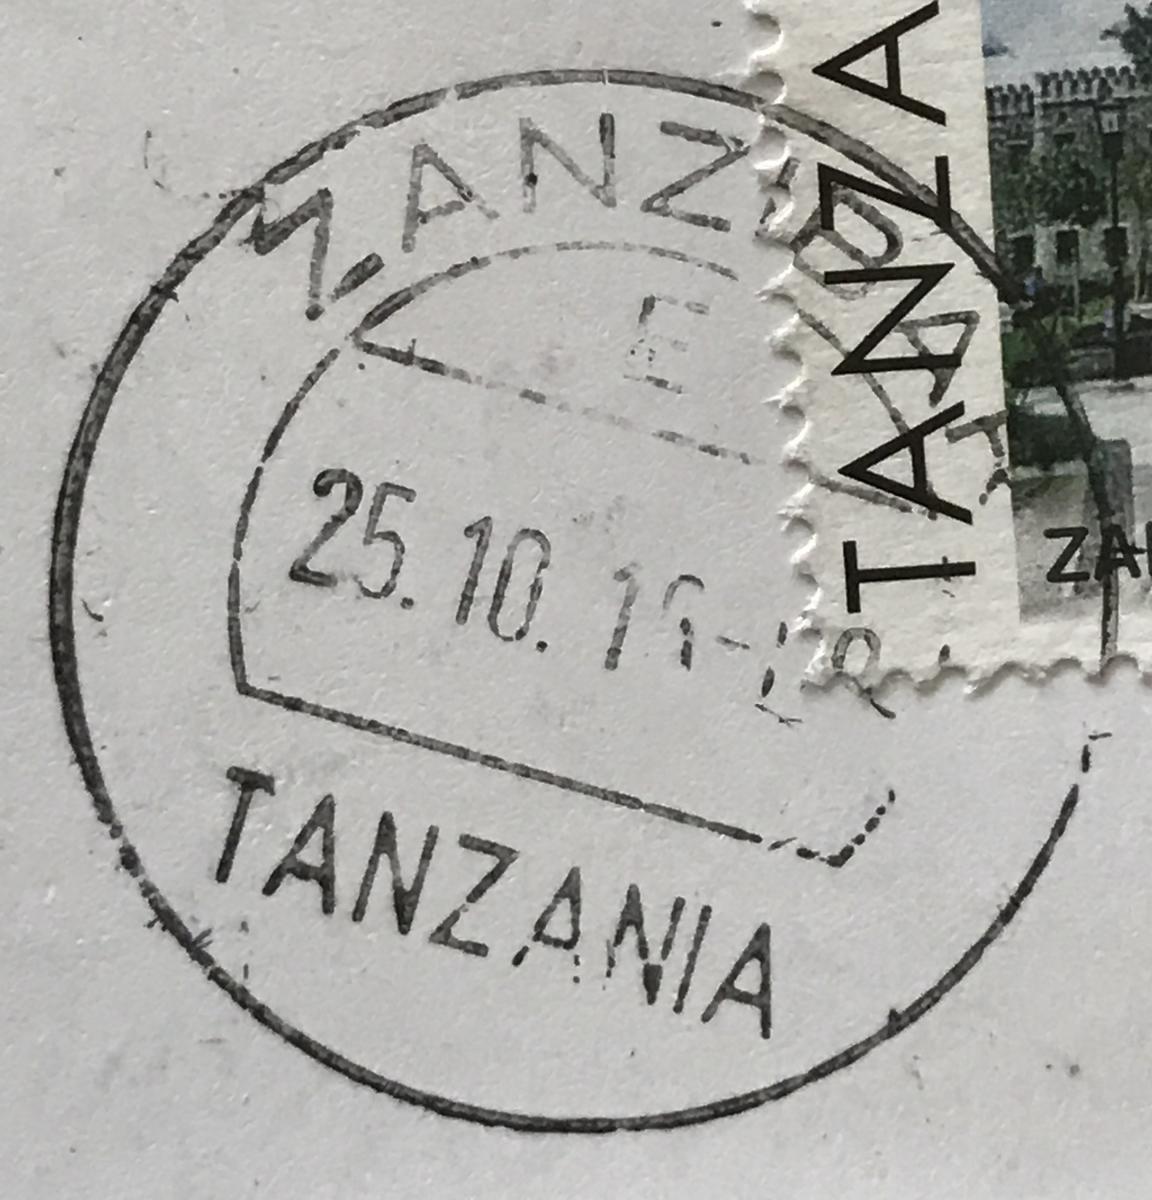 (detail) Zanzibar, Tanzania postmark cds